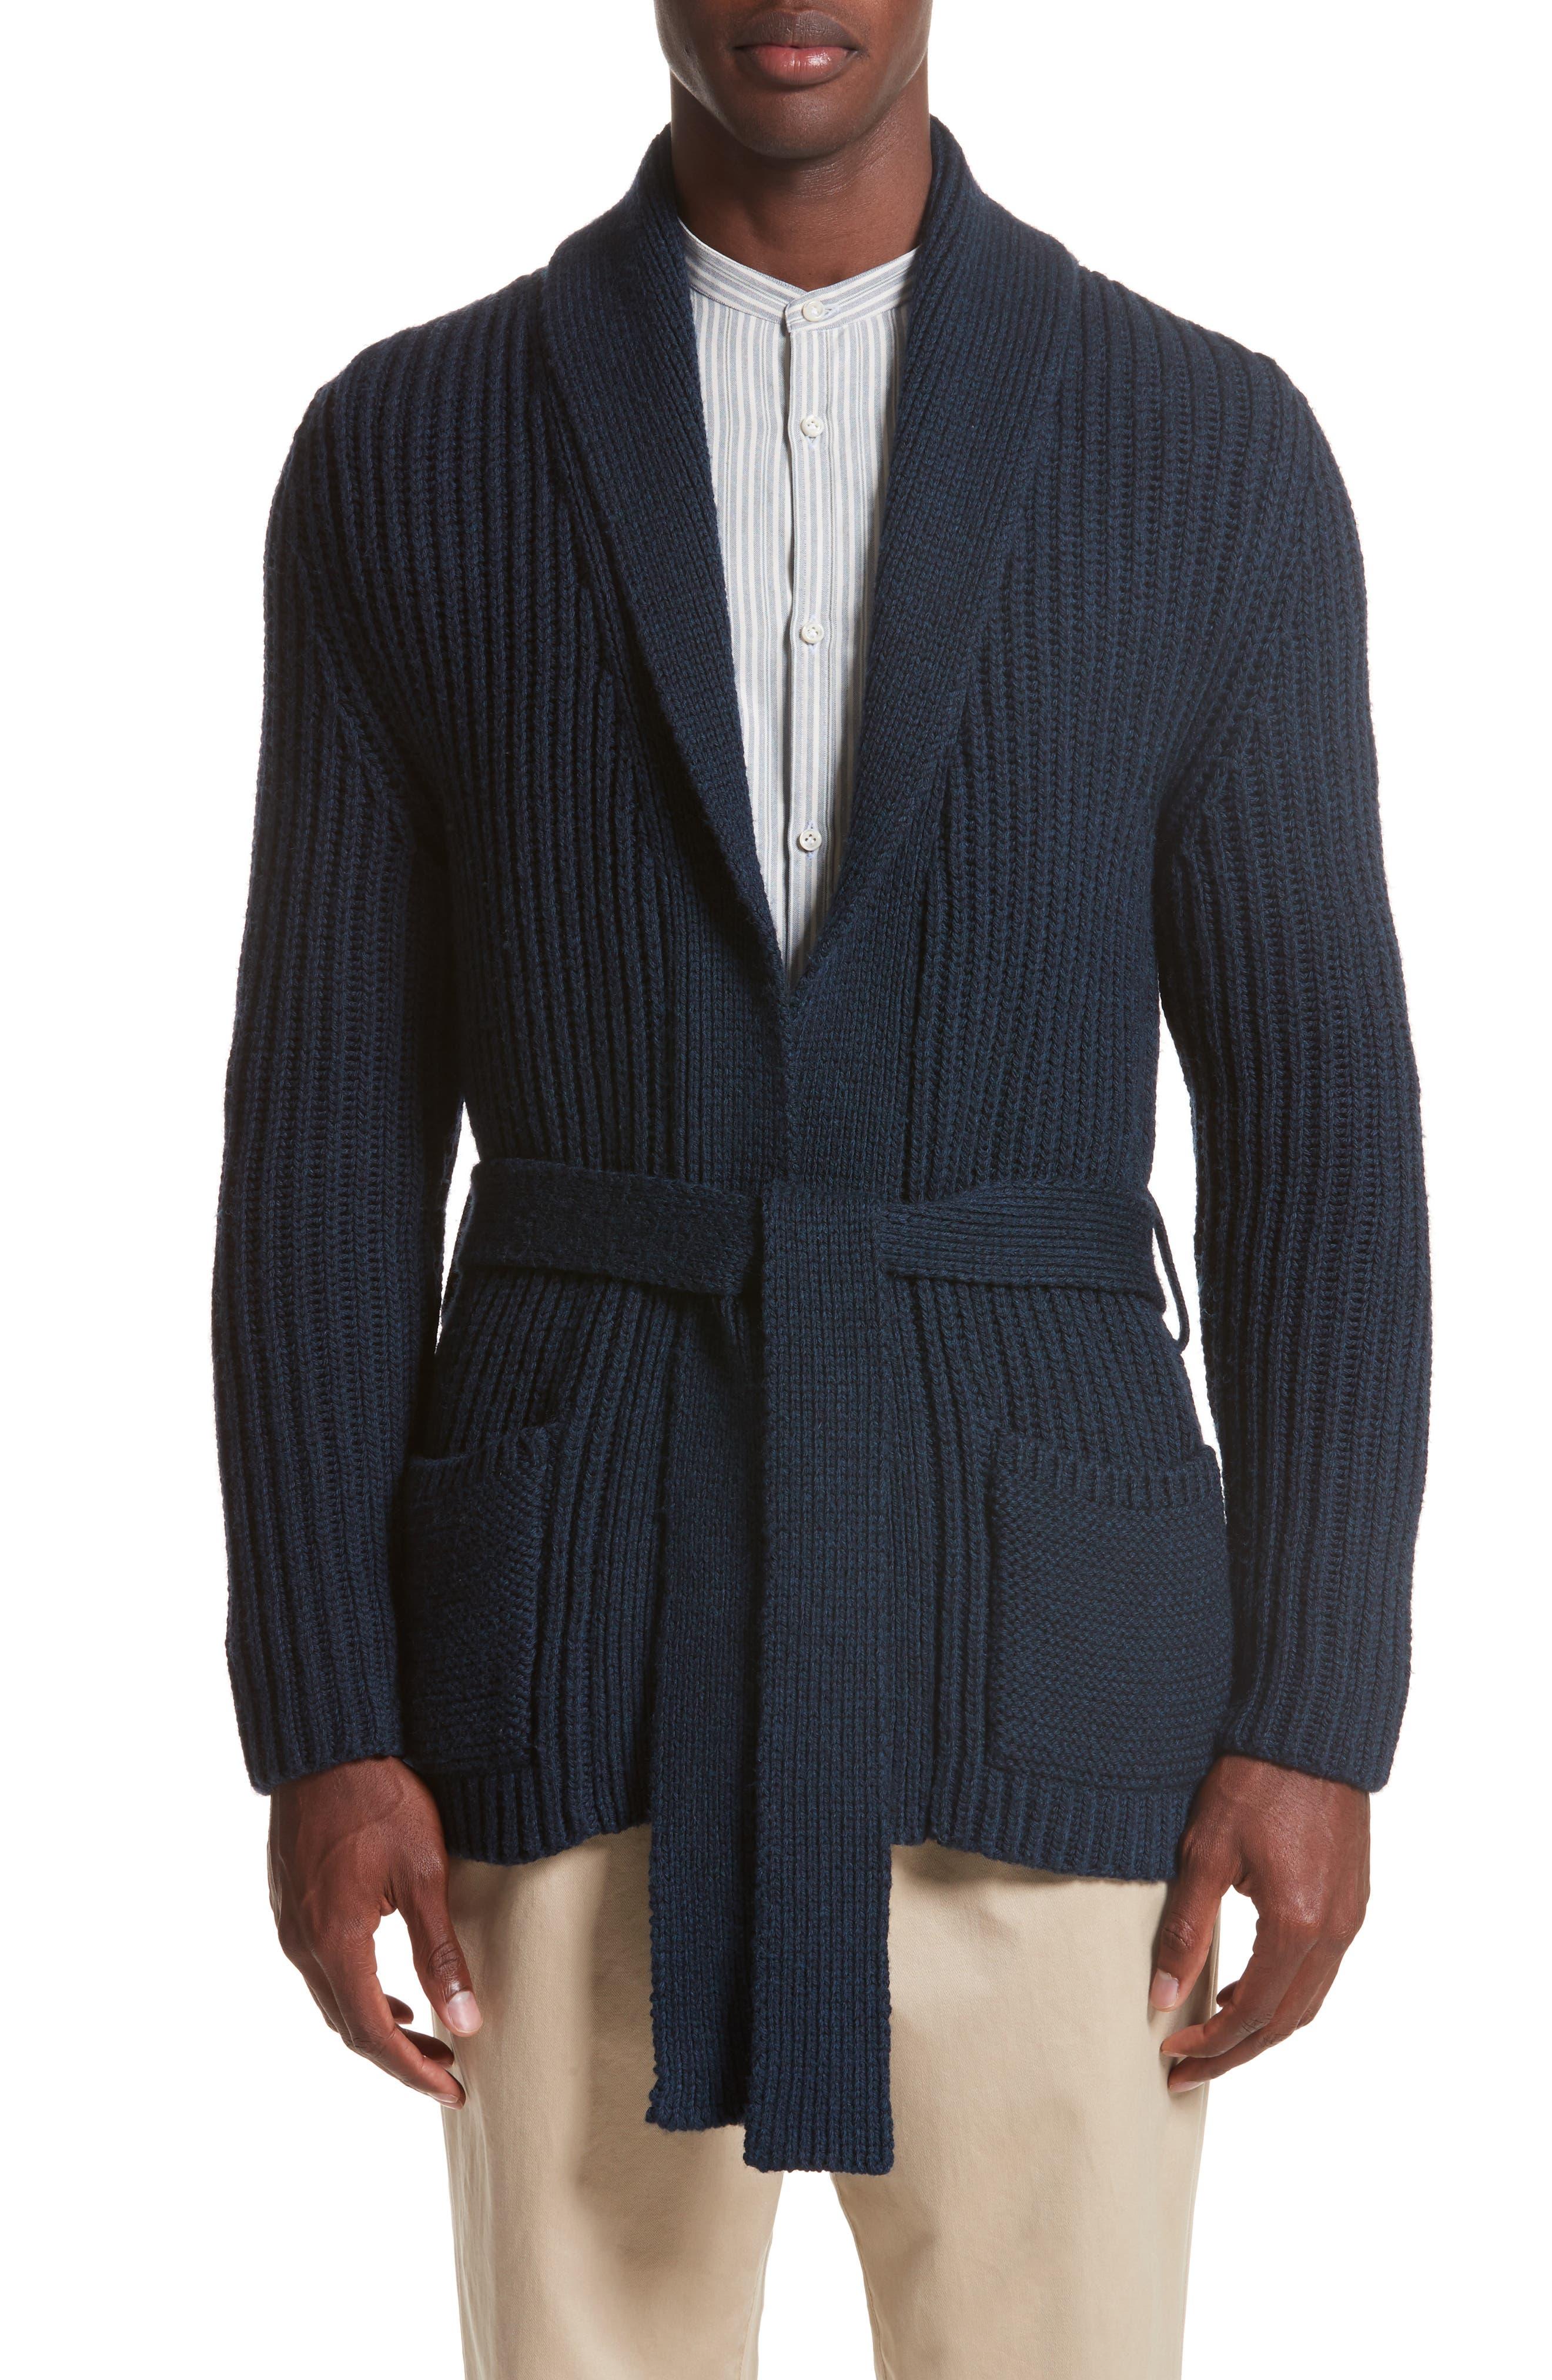 Alternate Image 1 Selected - Eidos Napoli Belted English Rib Shawl Collar Cardigan